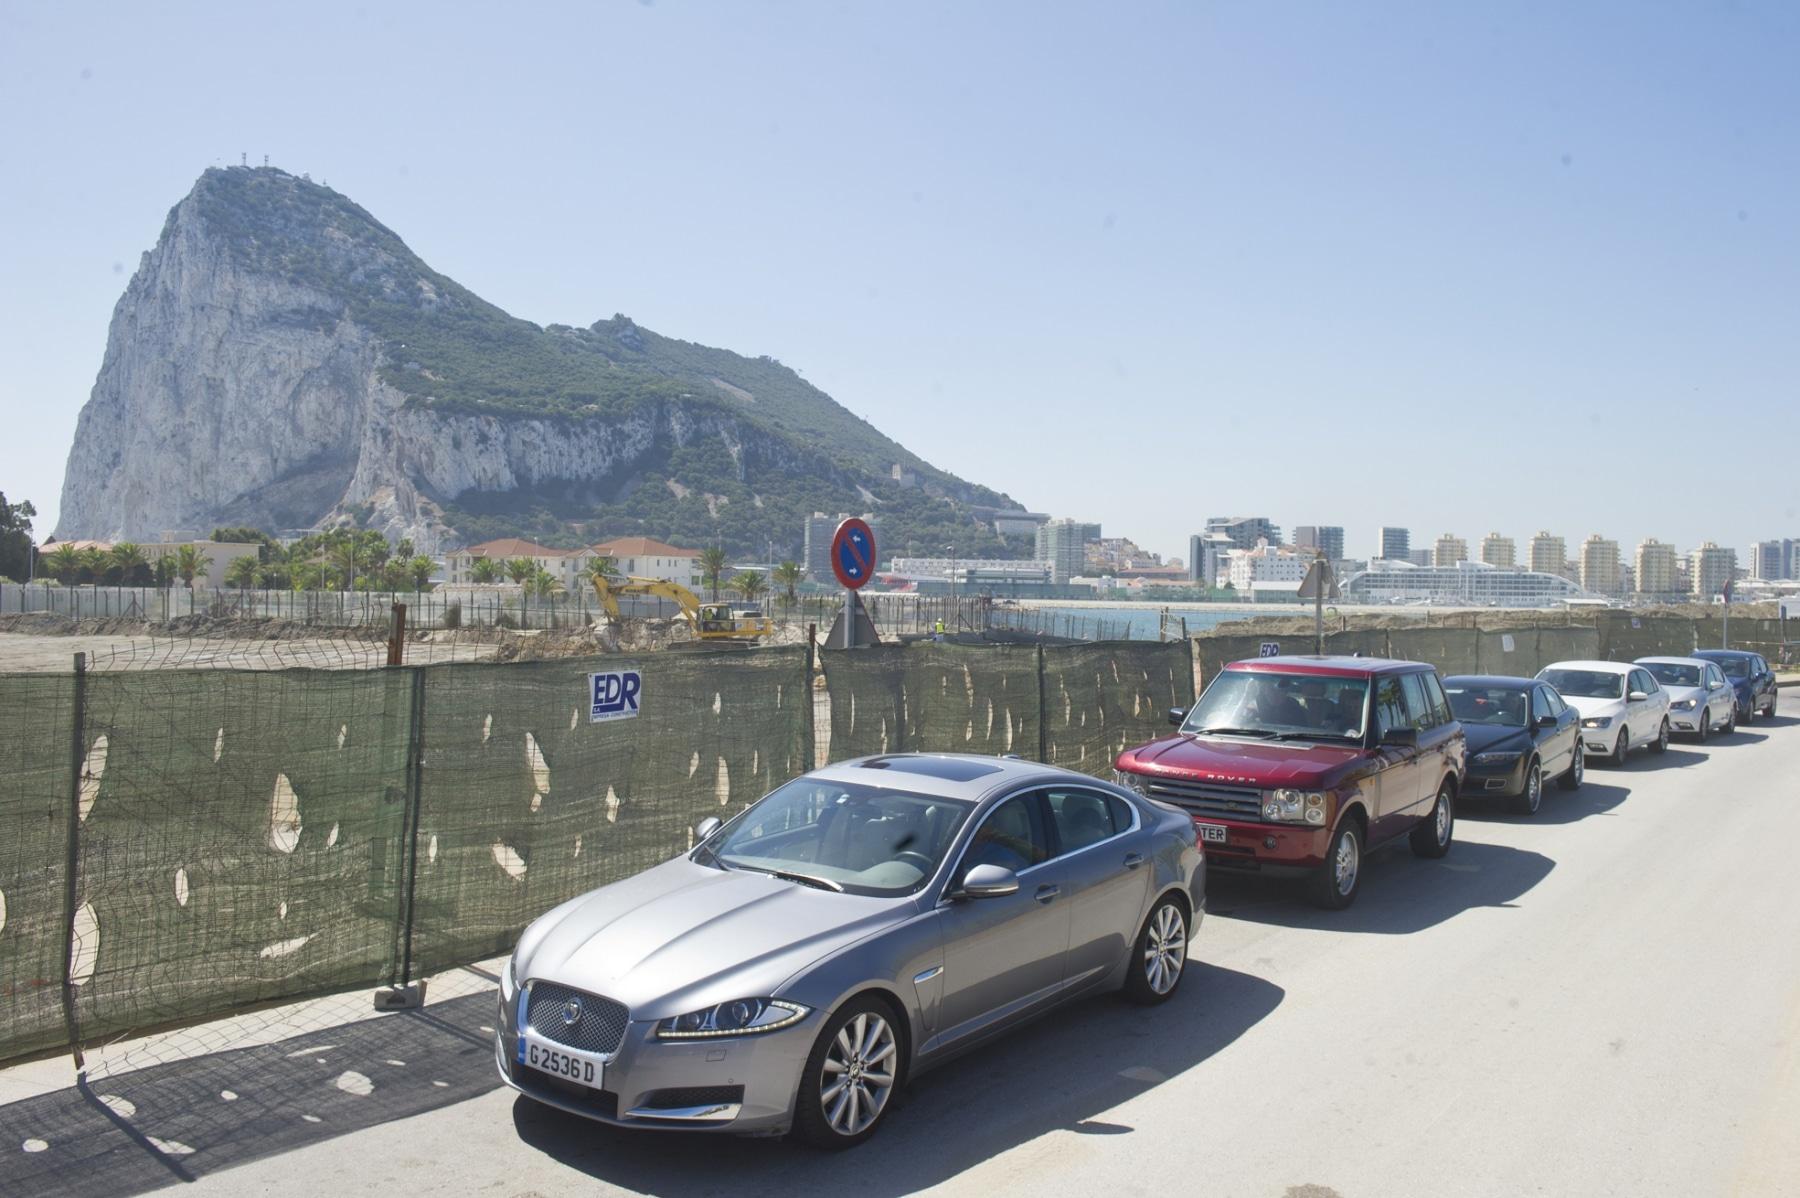 21-agosto-2014-colas-de-entrada-y-salida-de-gibraltar04_14989400172_o